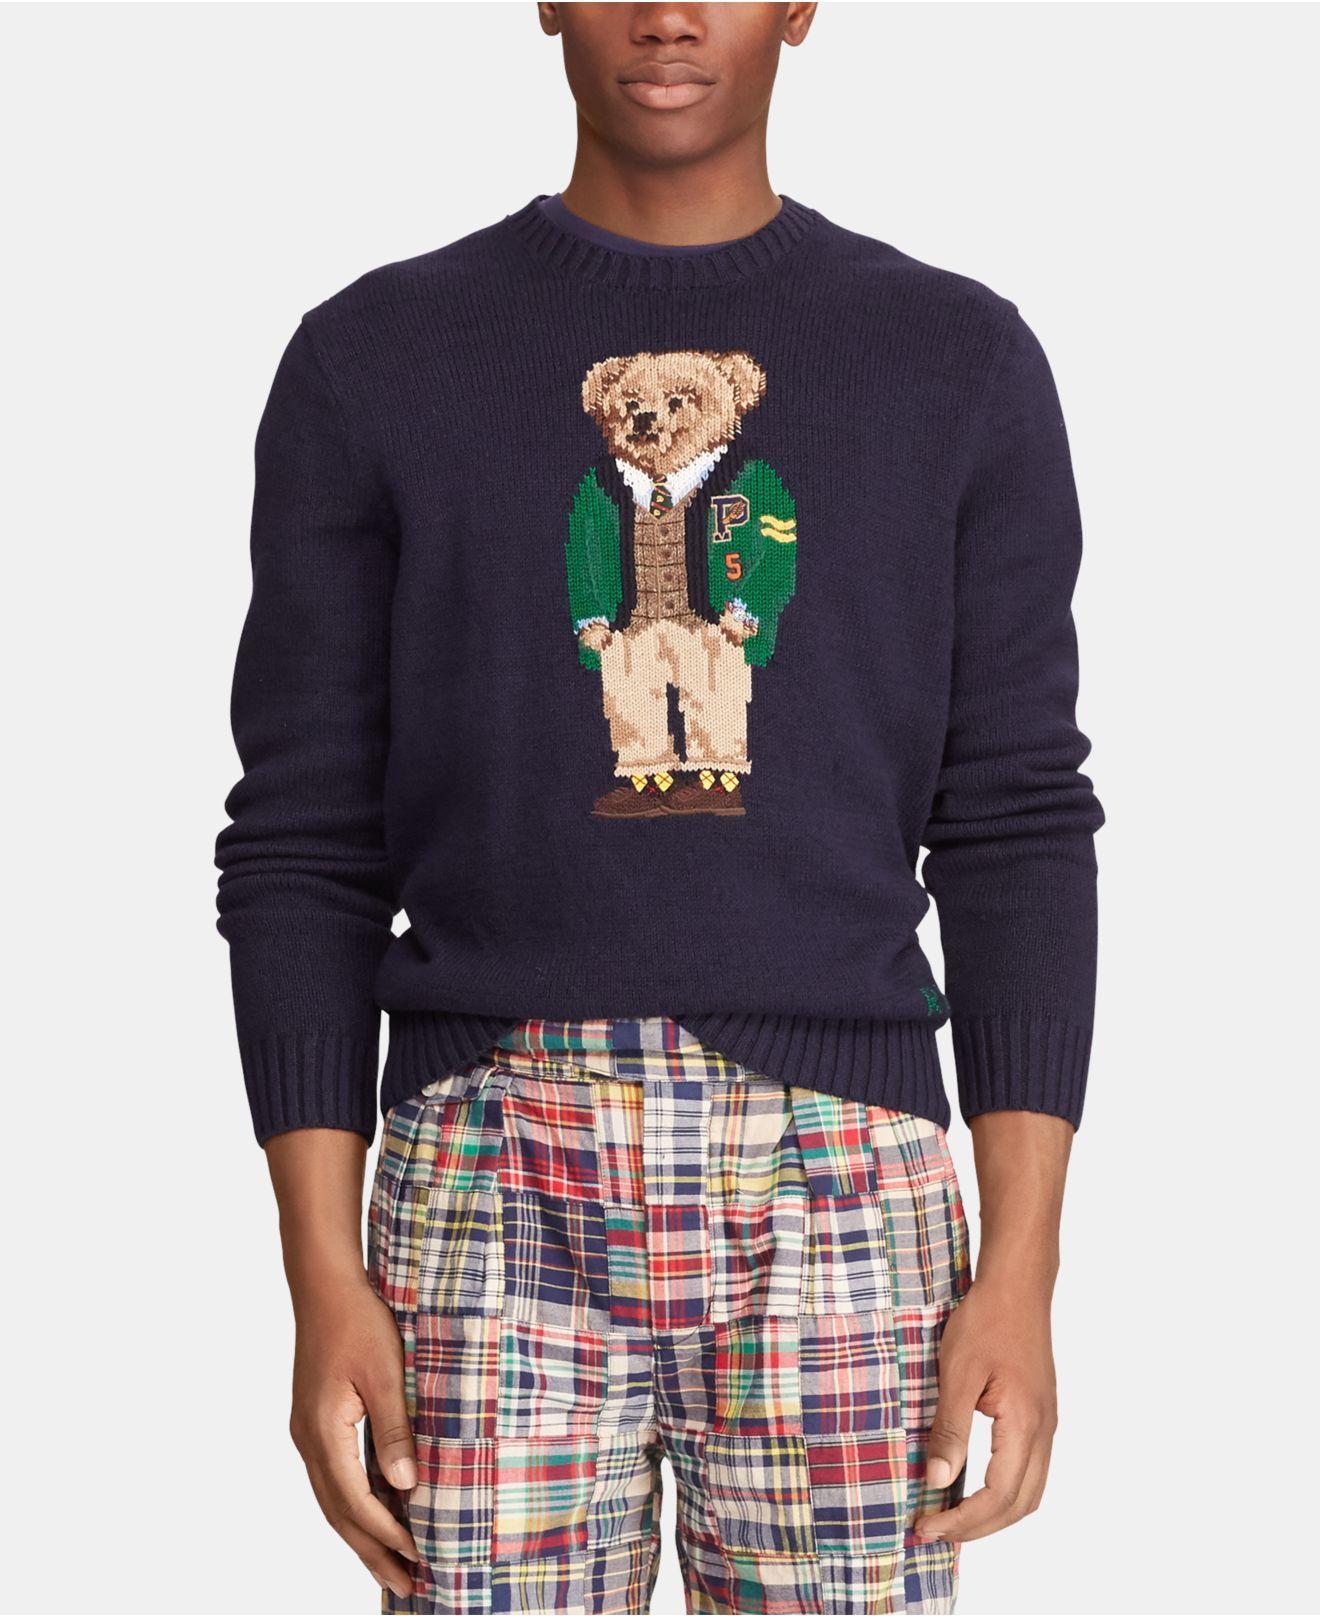 3f9e1c15123 Lyst - Polo Ralph Lauren Polo Bear Sweater in Blue for Men